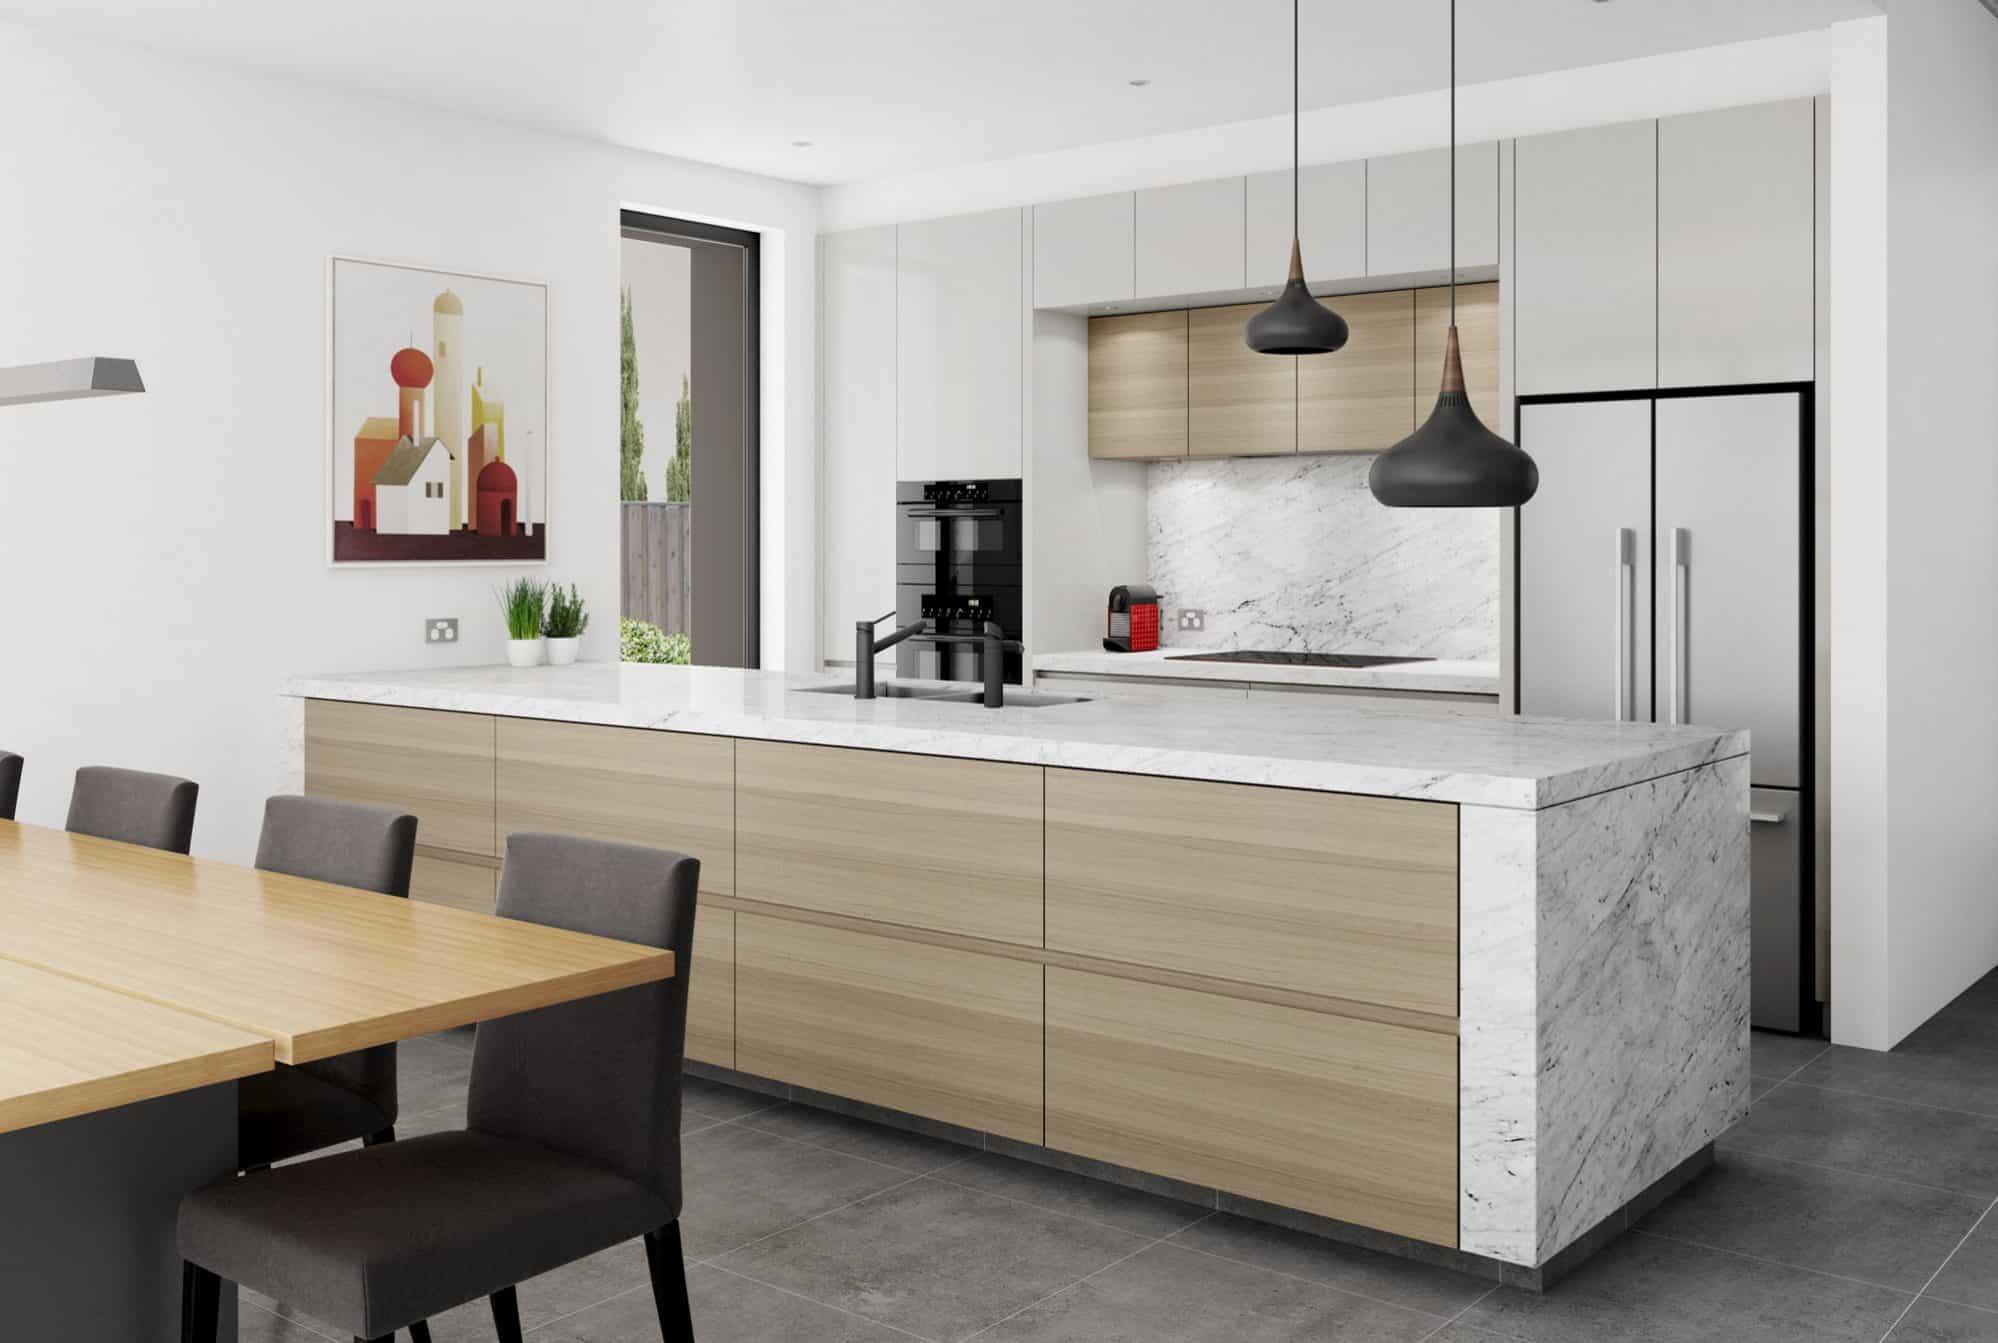 Light grey and timber kitchen with Carrara island